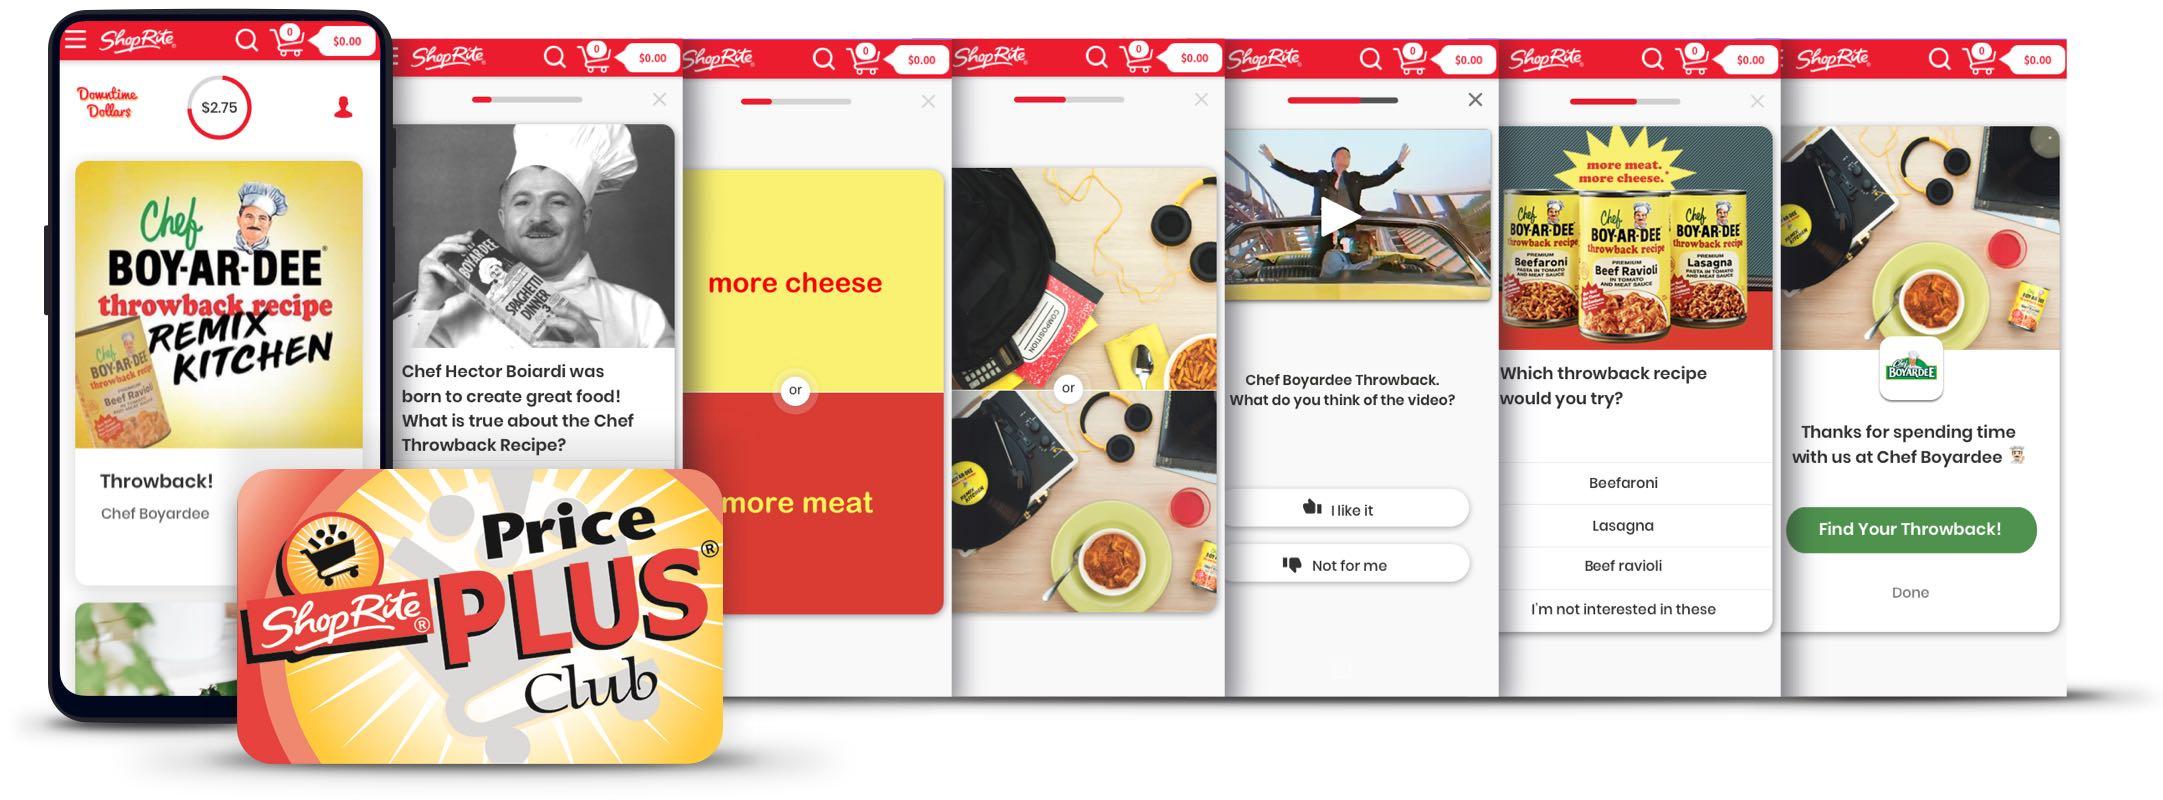 Chef Boyardee brand experience on ShopRite's Downtime Dollars